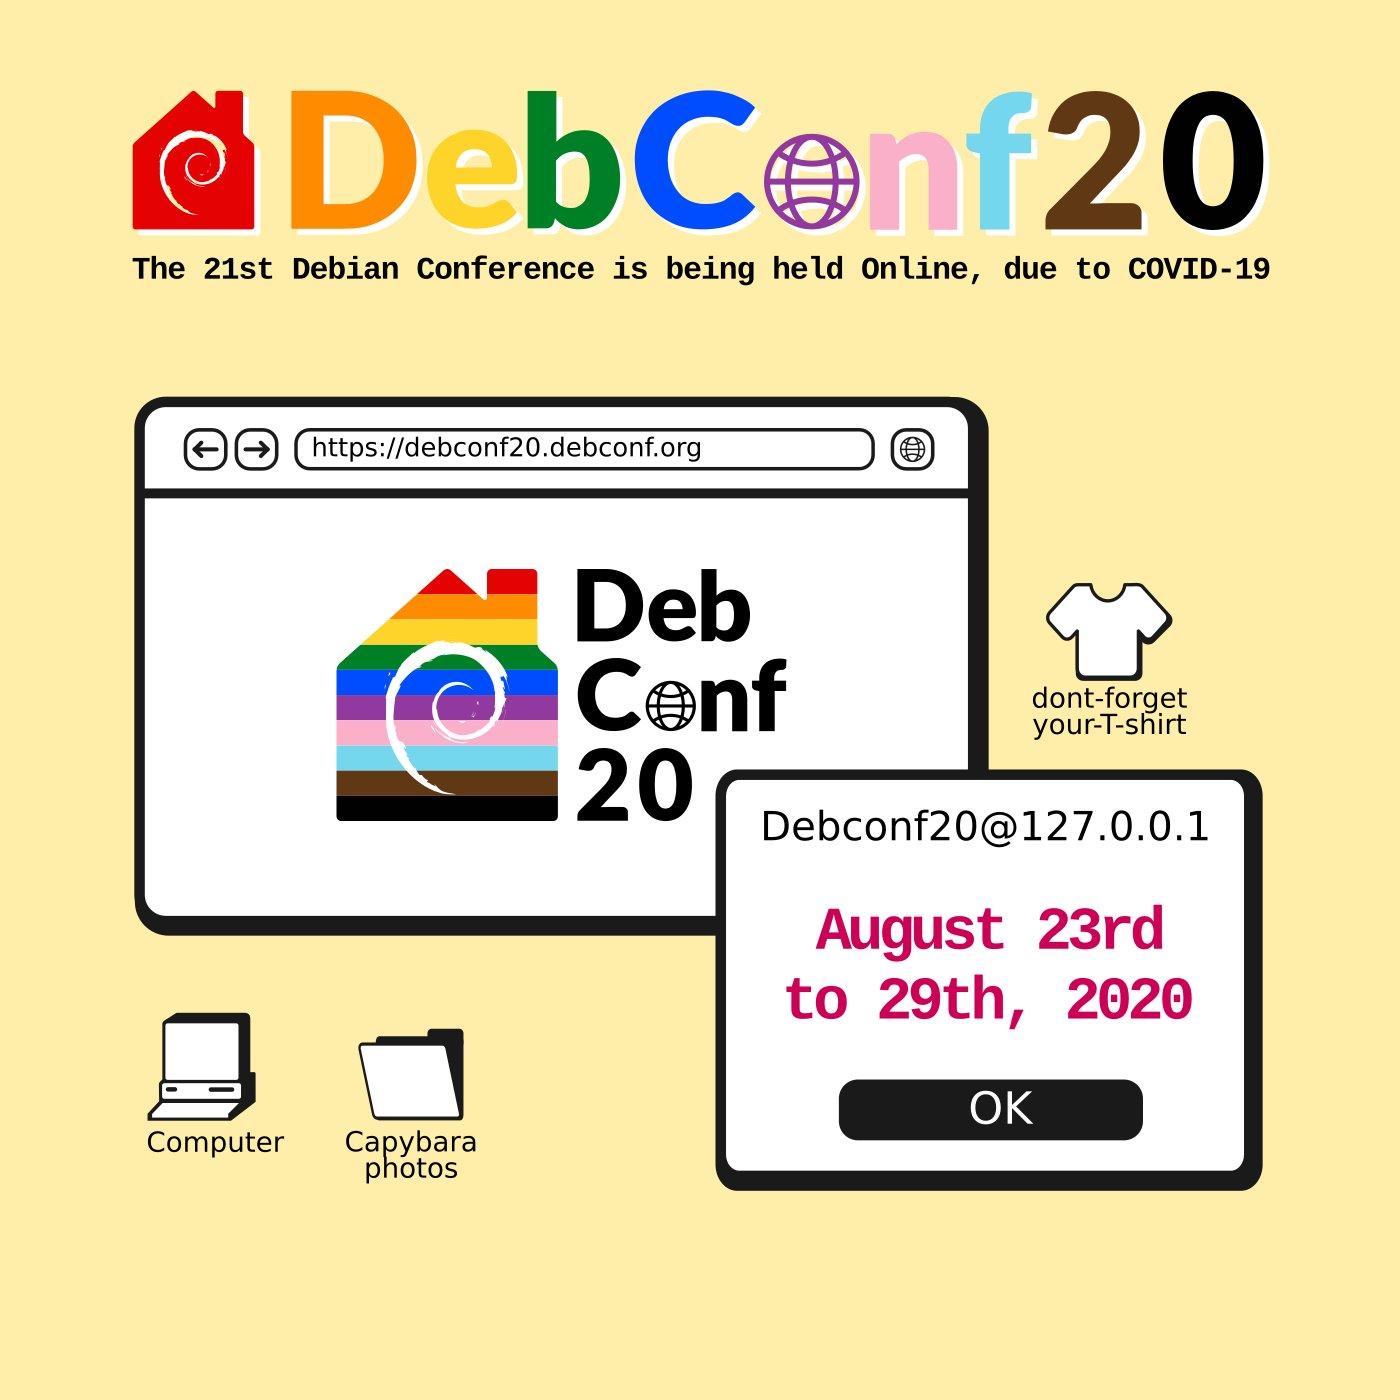 DebConf20-Online-visual-identity